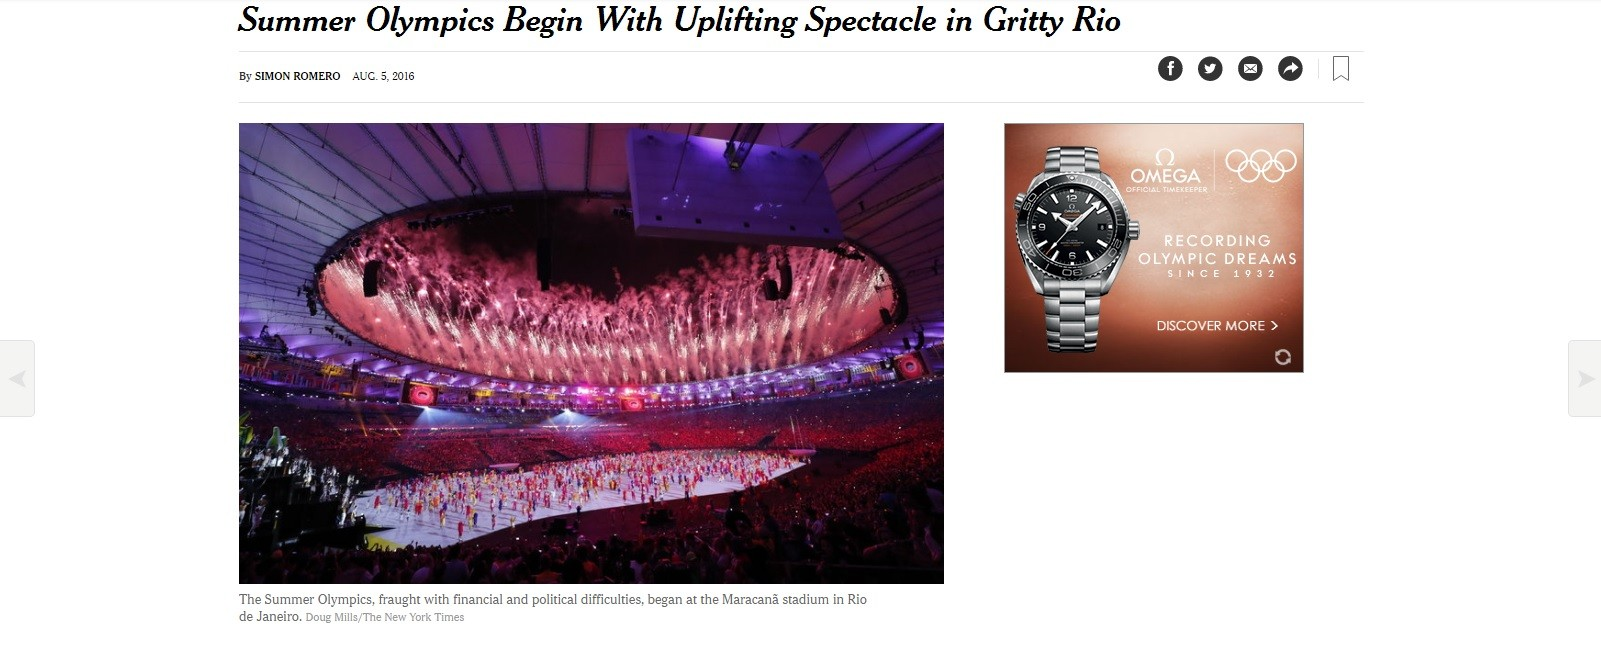 nyt, new york times, cerimonia abertura, guardian